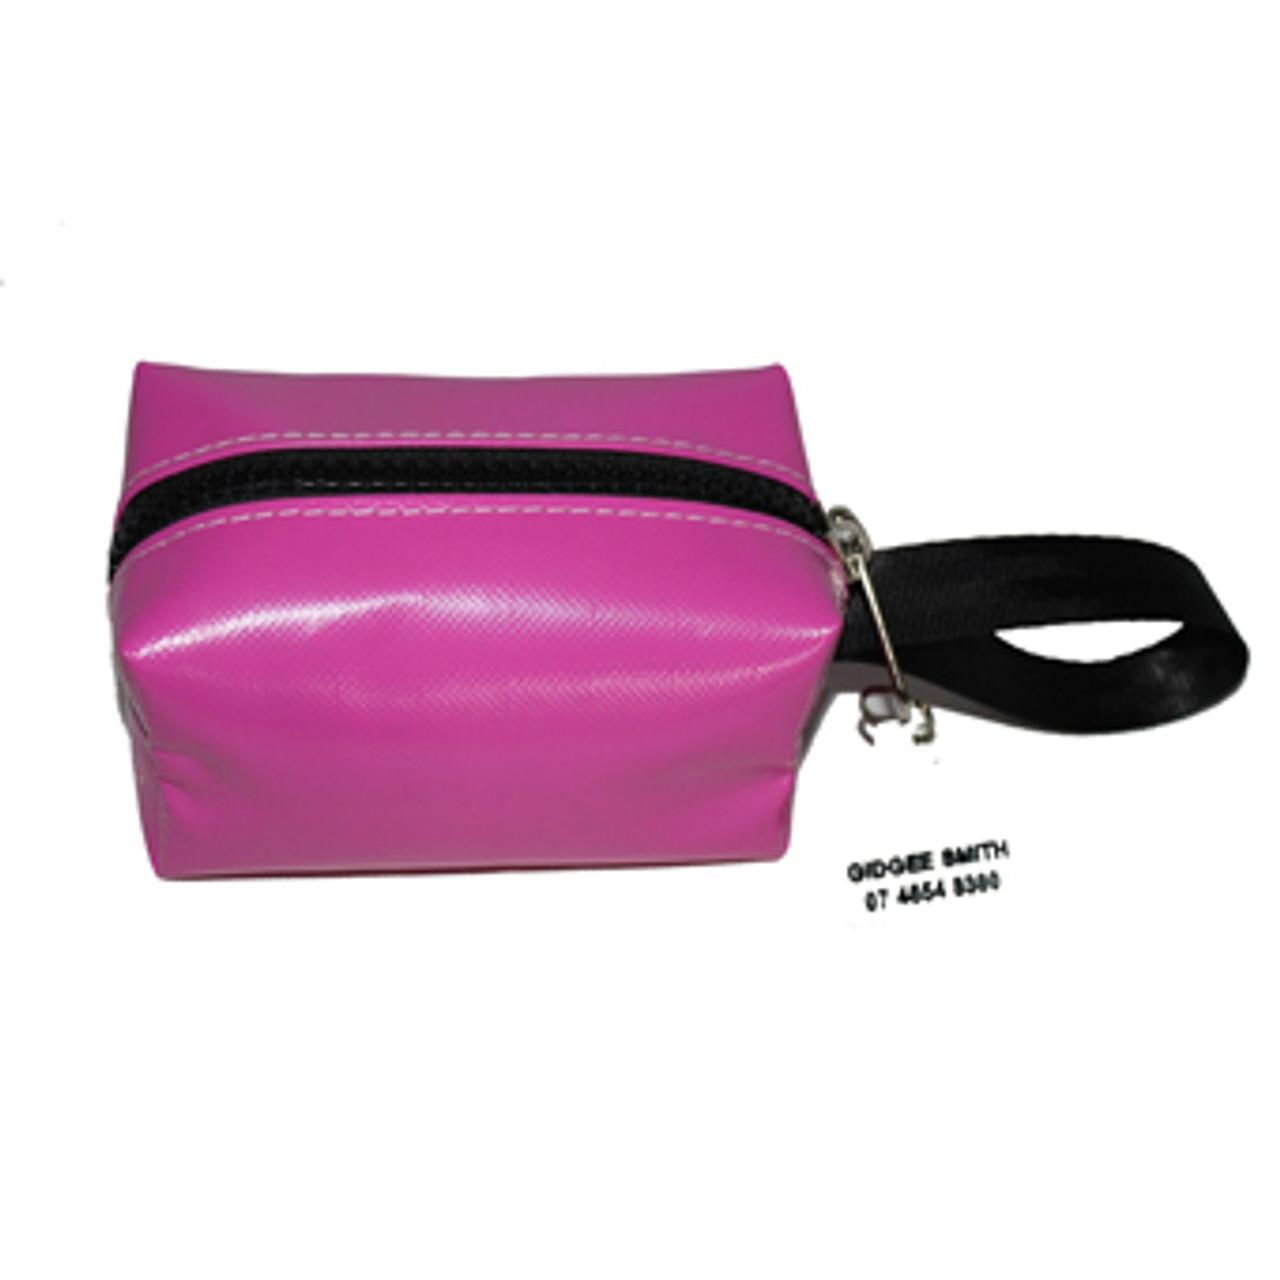 Make-Up Case-Small pvc 14cm L x 9cm H x 8cm  W Australian Made pvc gear bags